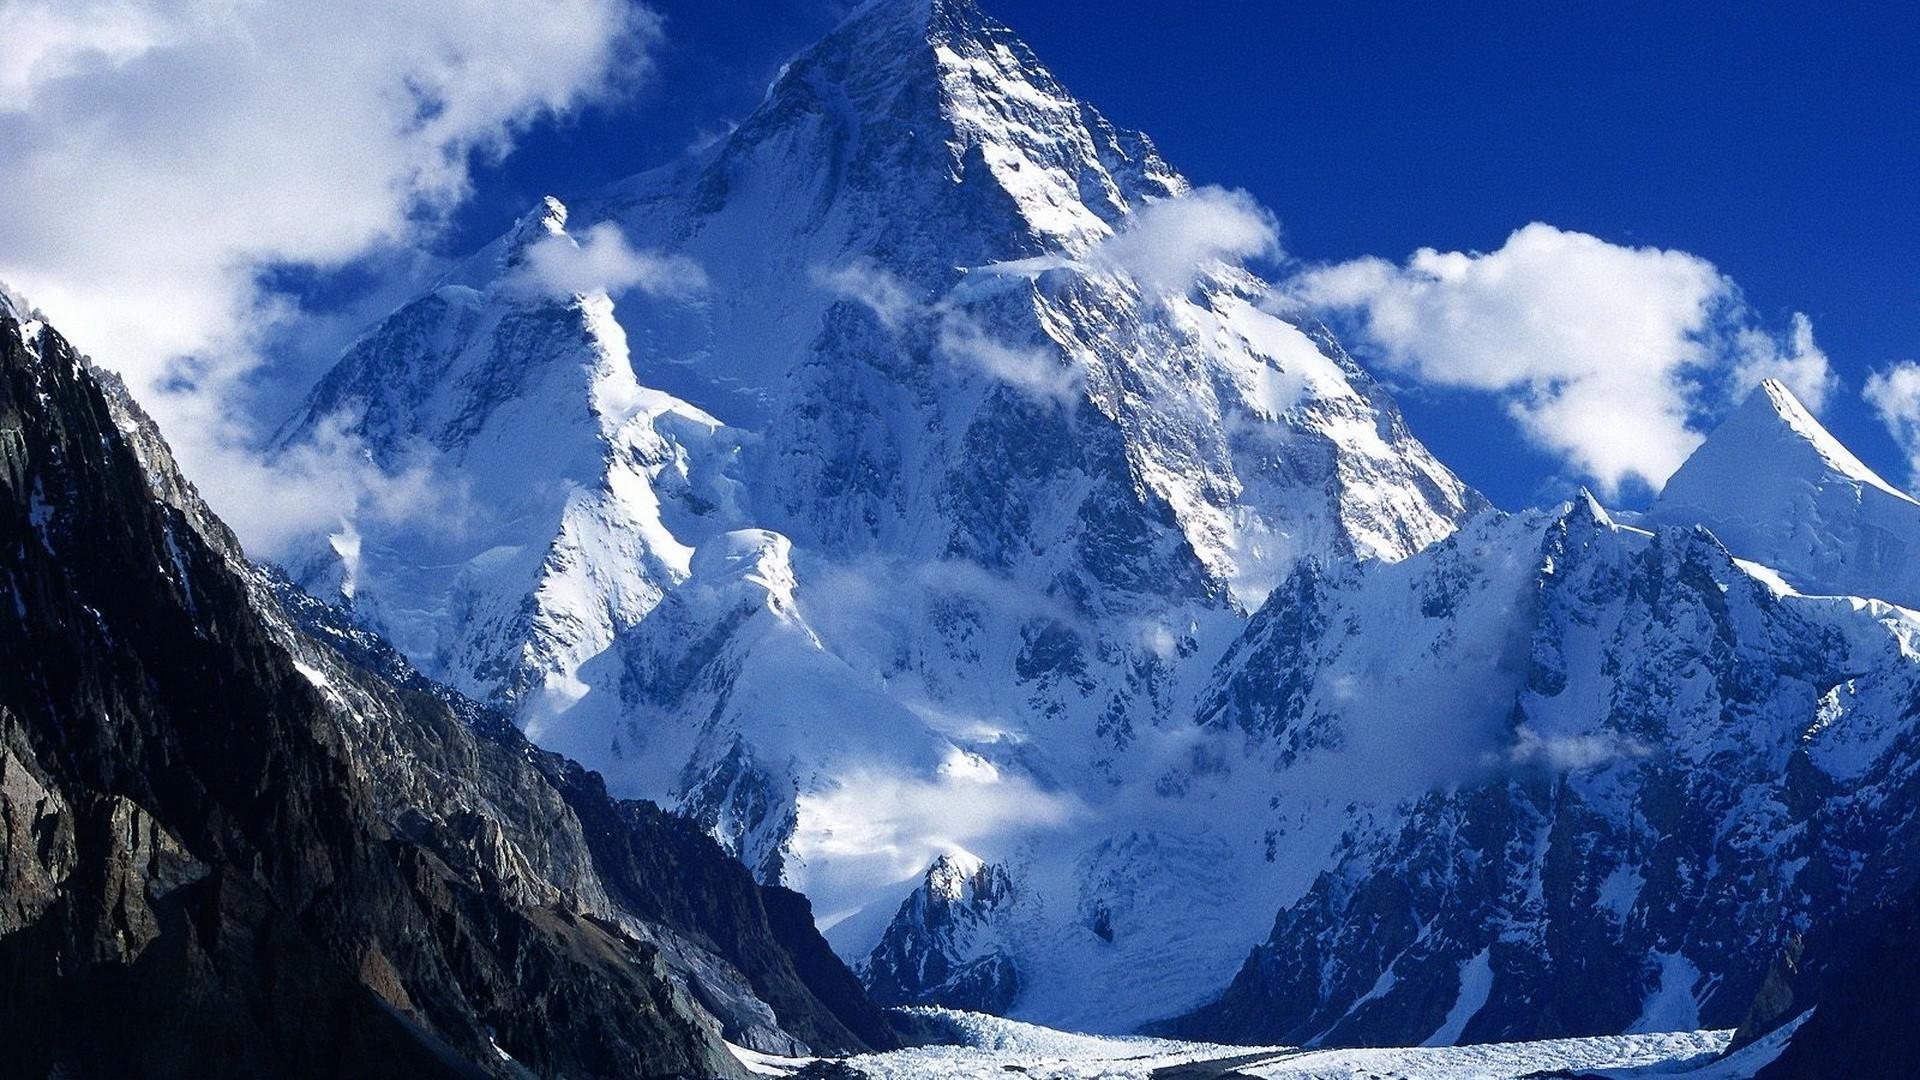 Snowy Mountain Wallpaper Wallpapersafari